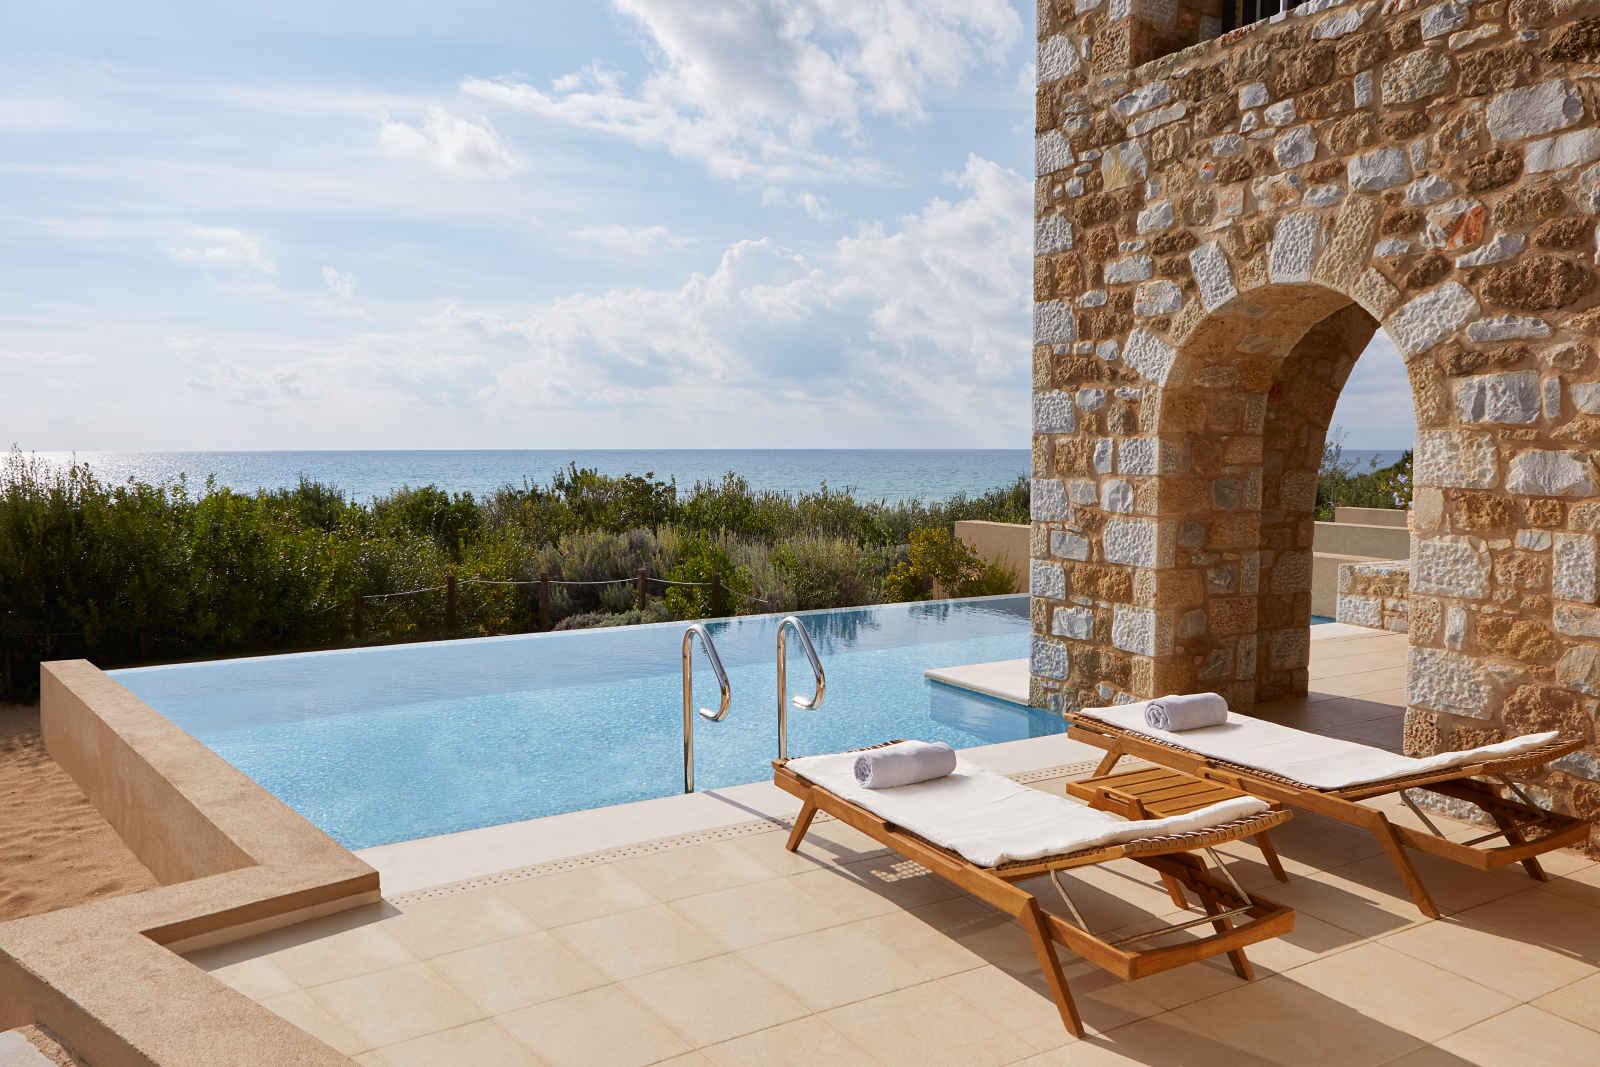 The Westin Resort Costa Navarino (arrivée Athènes) - 5*